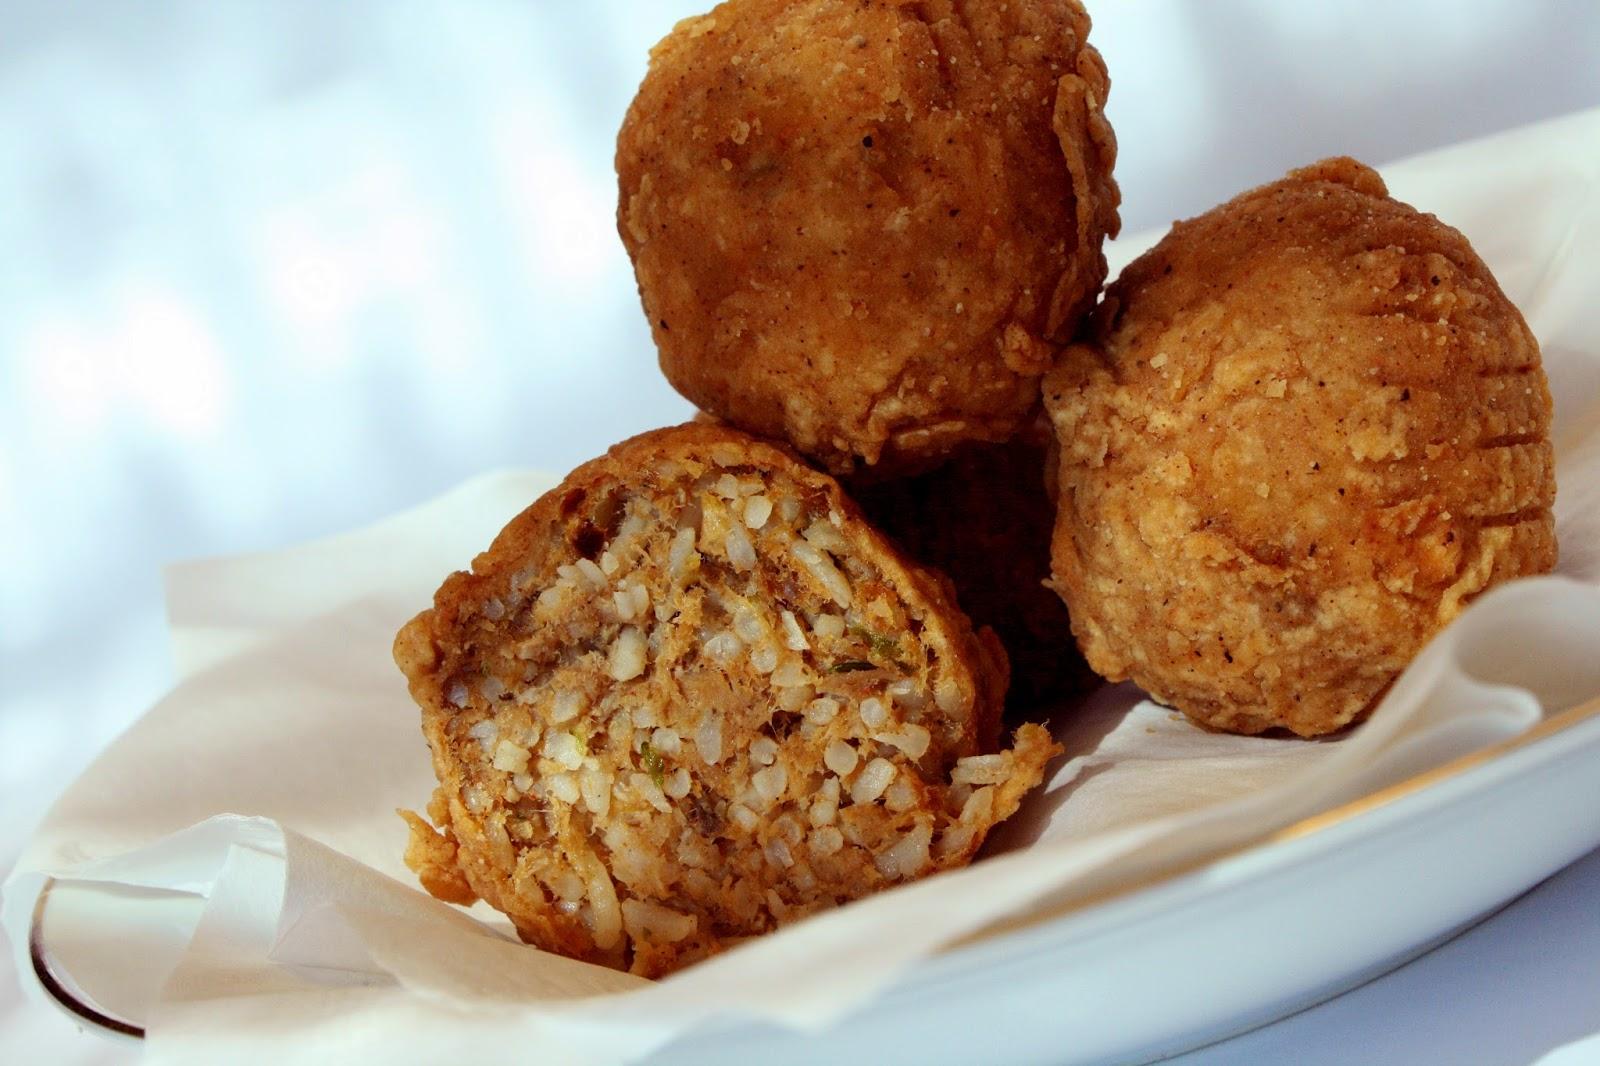 5 Must Eat Fried Foods in Lake Charles